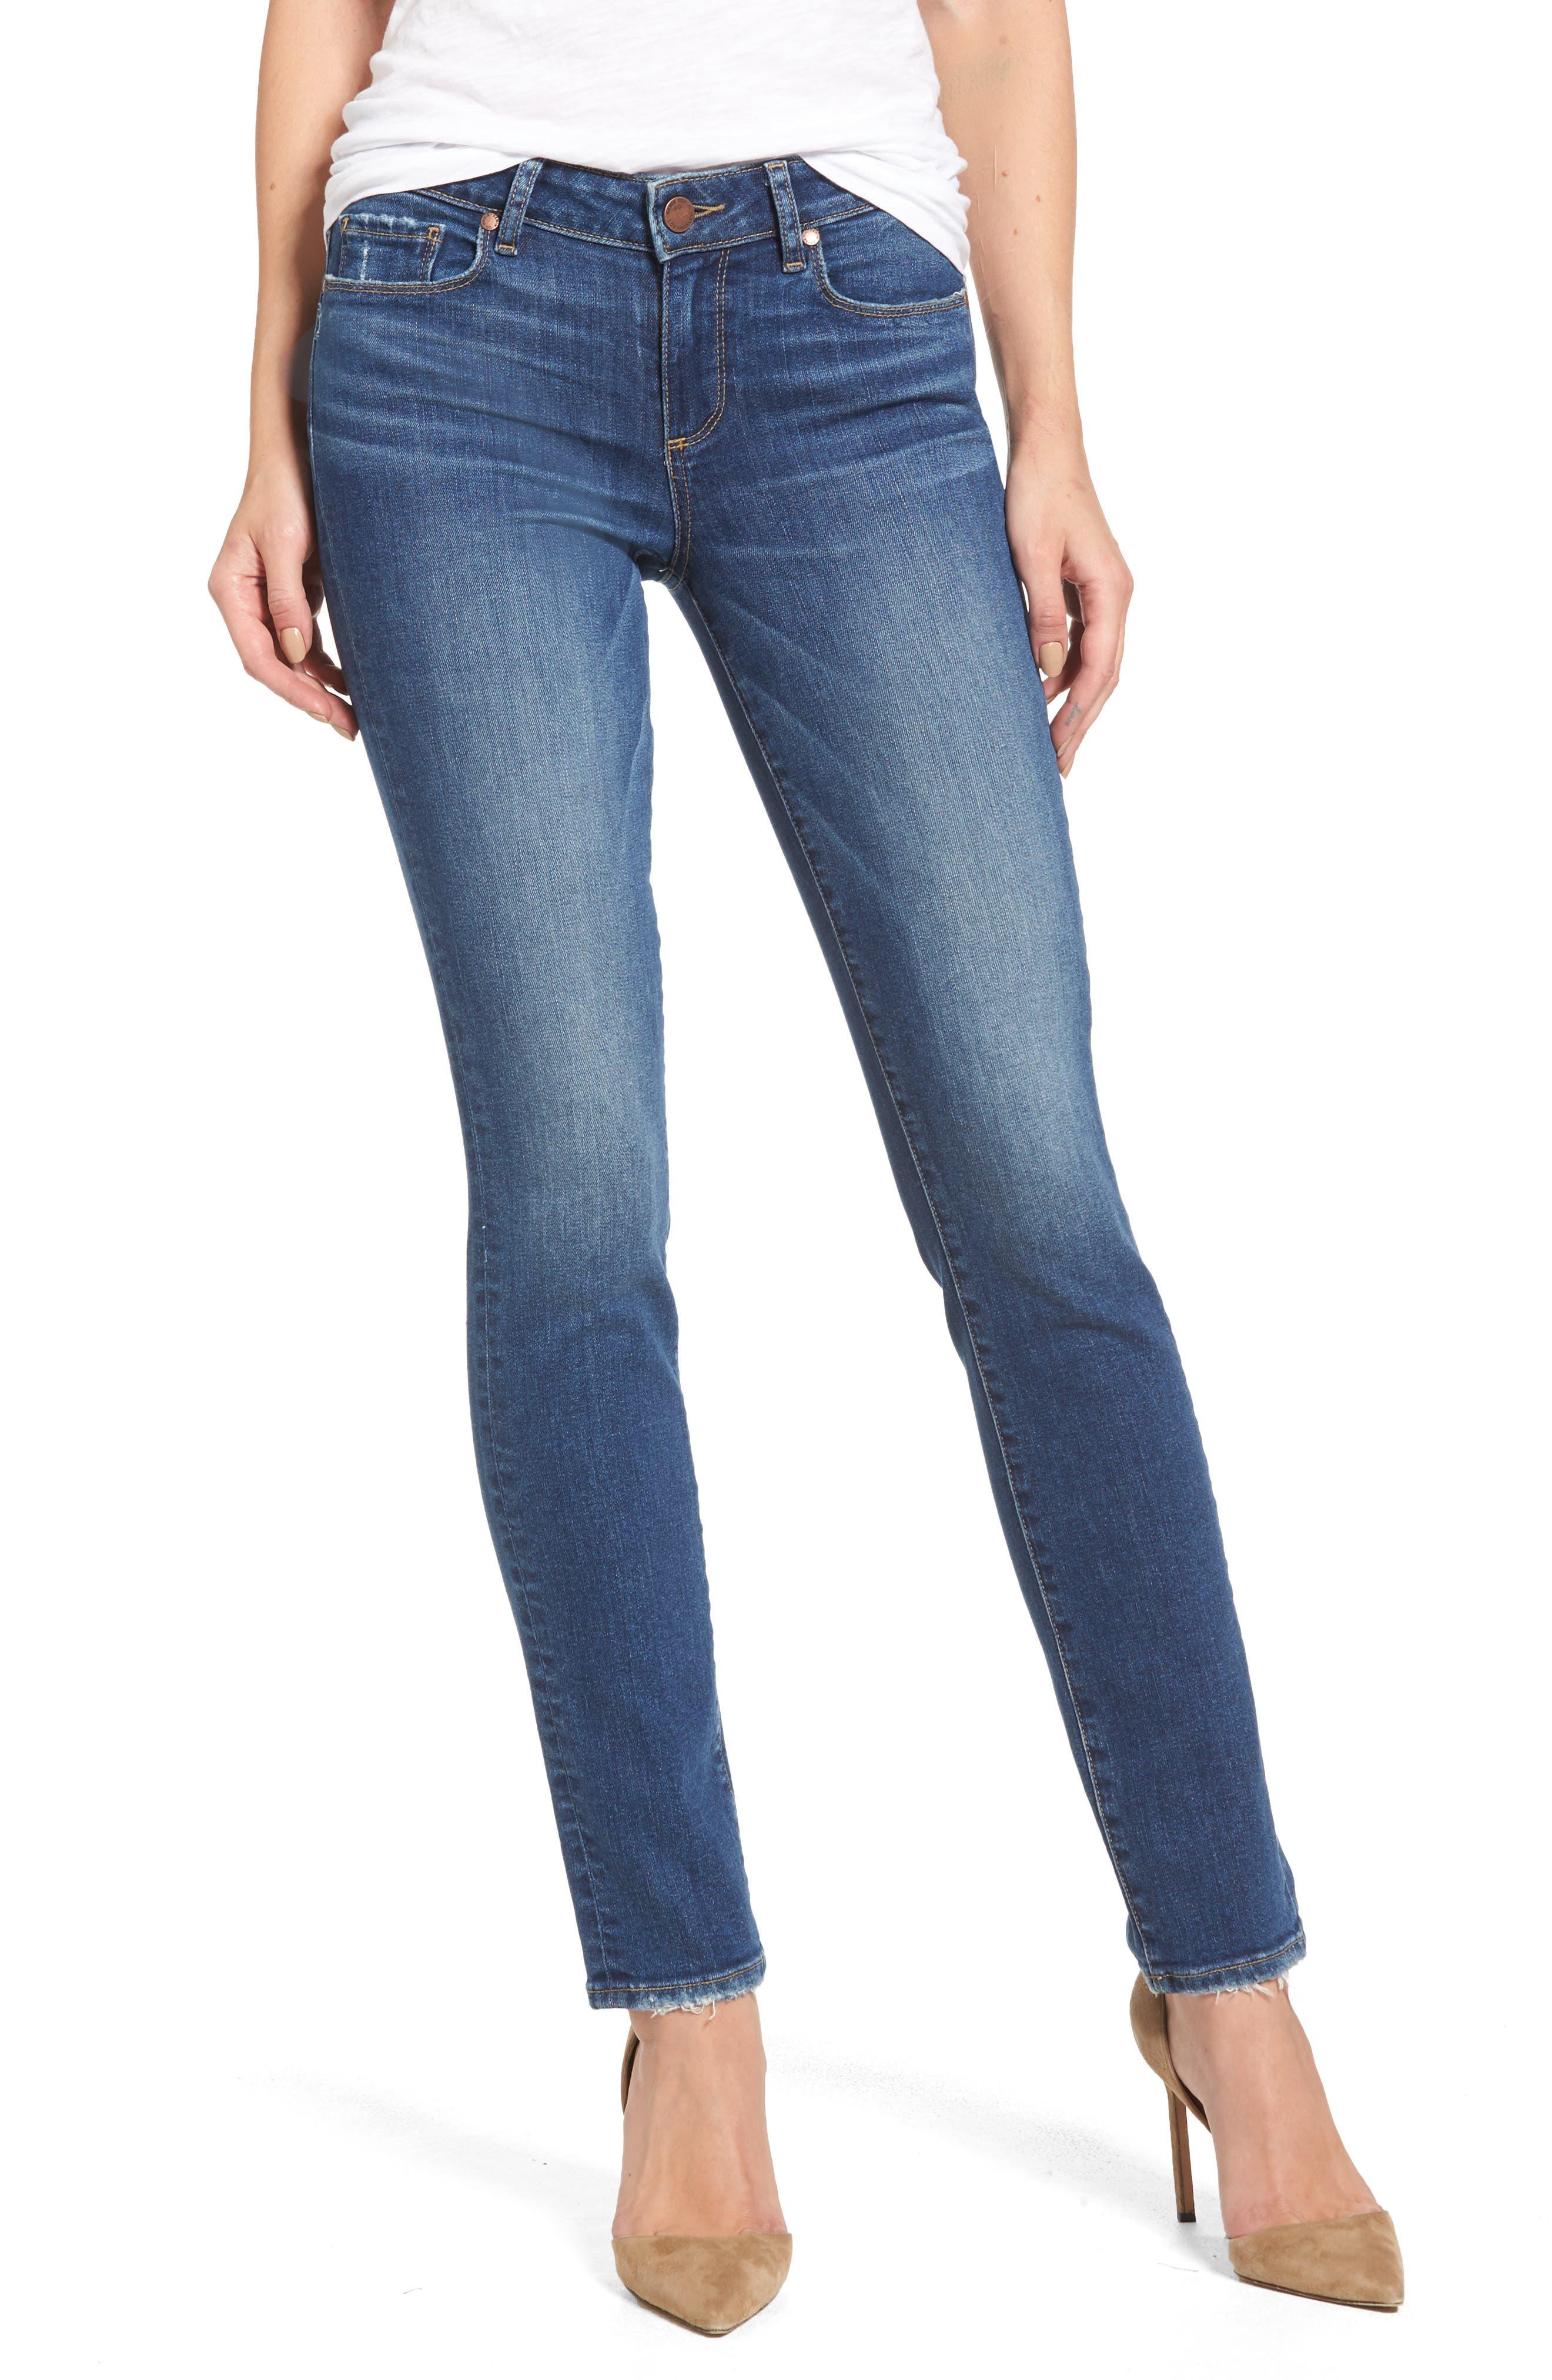 Skyline Skinny Jeans,                         Main,                         color, 400